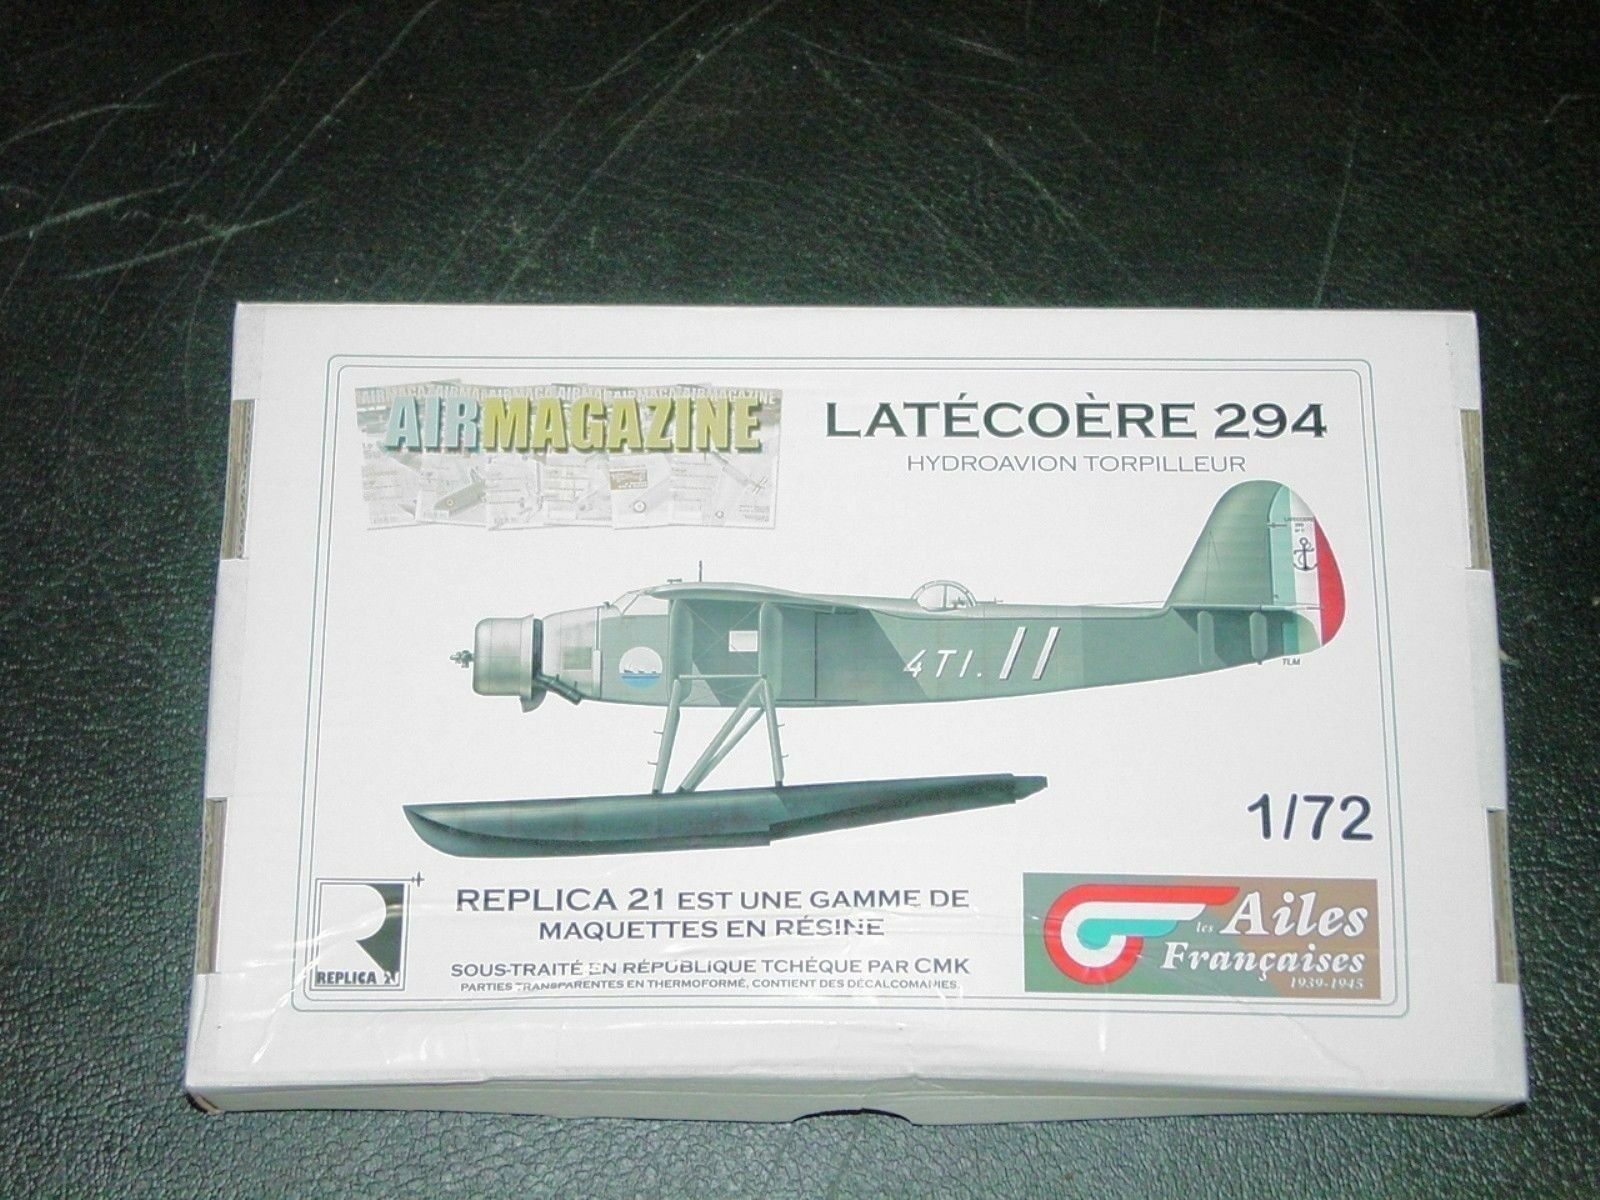 Latecoere 294  French WWII Floatplane Torpedo Bomber Replica 21 TMA 1 72 Resin